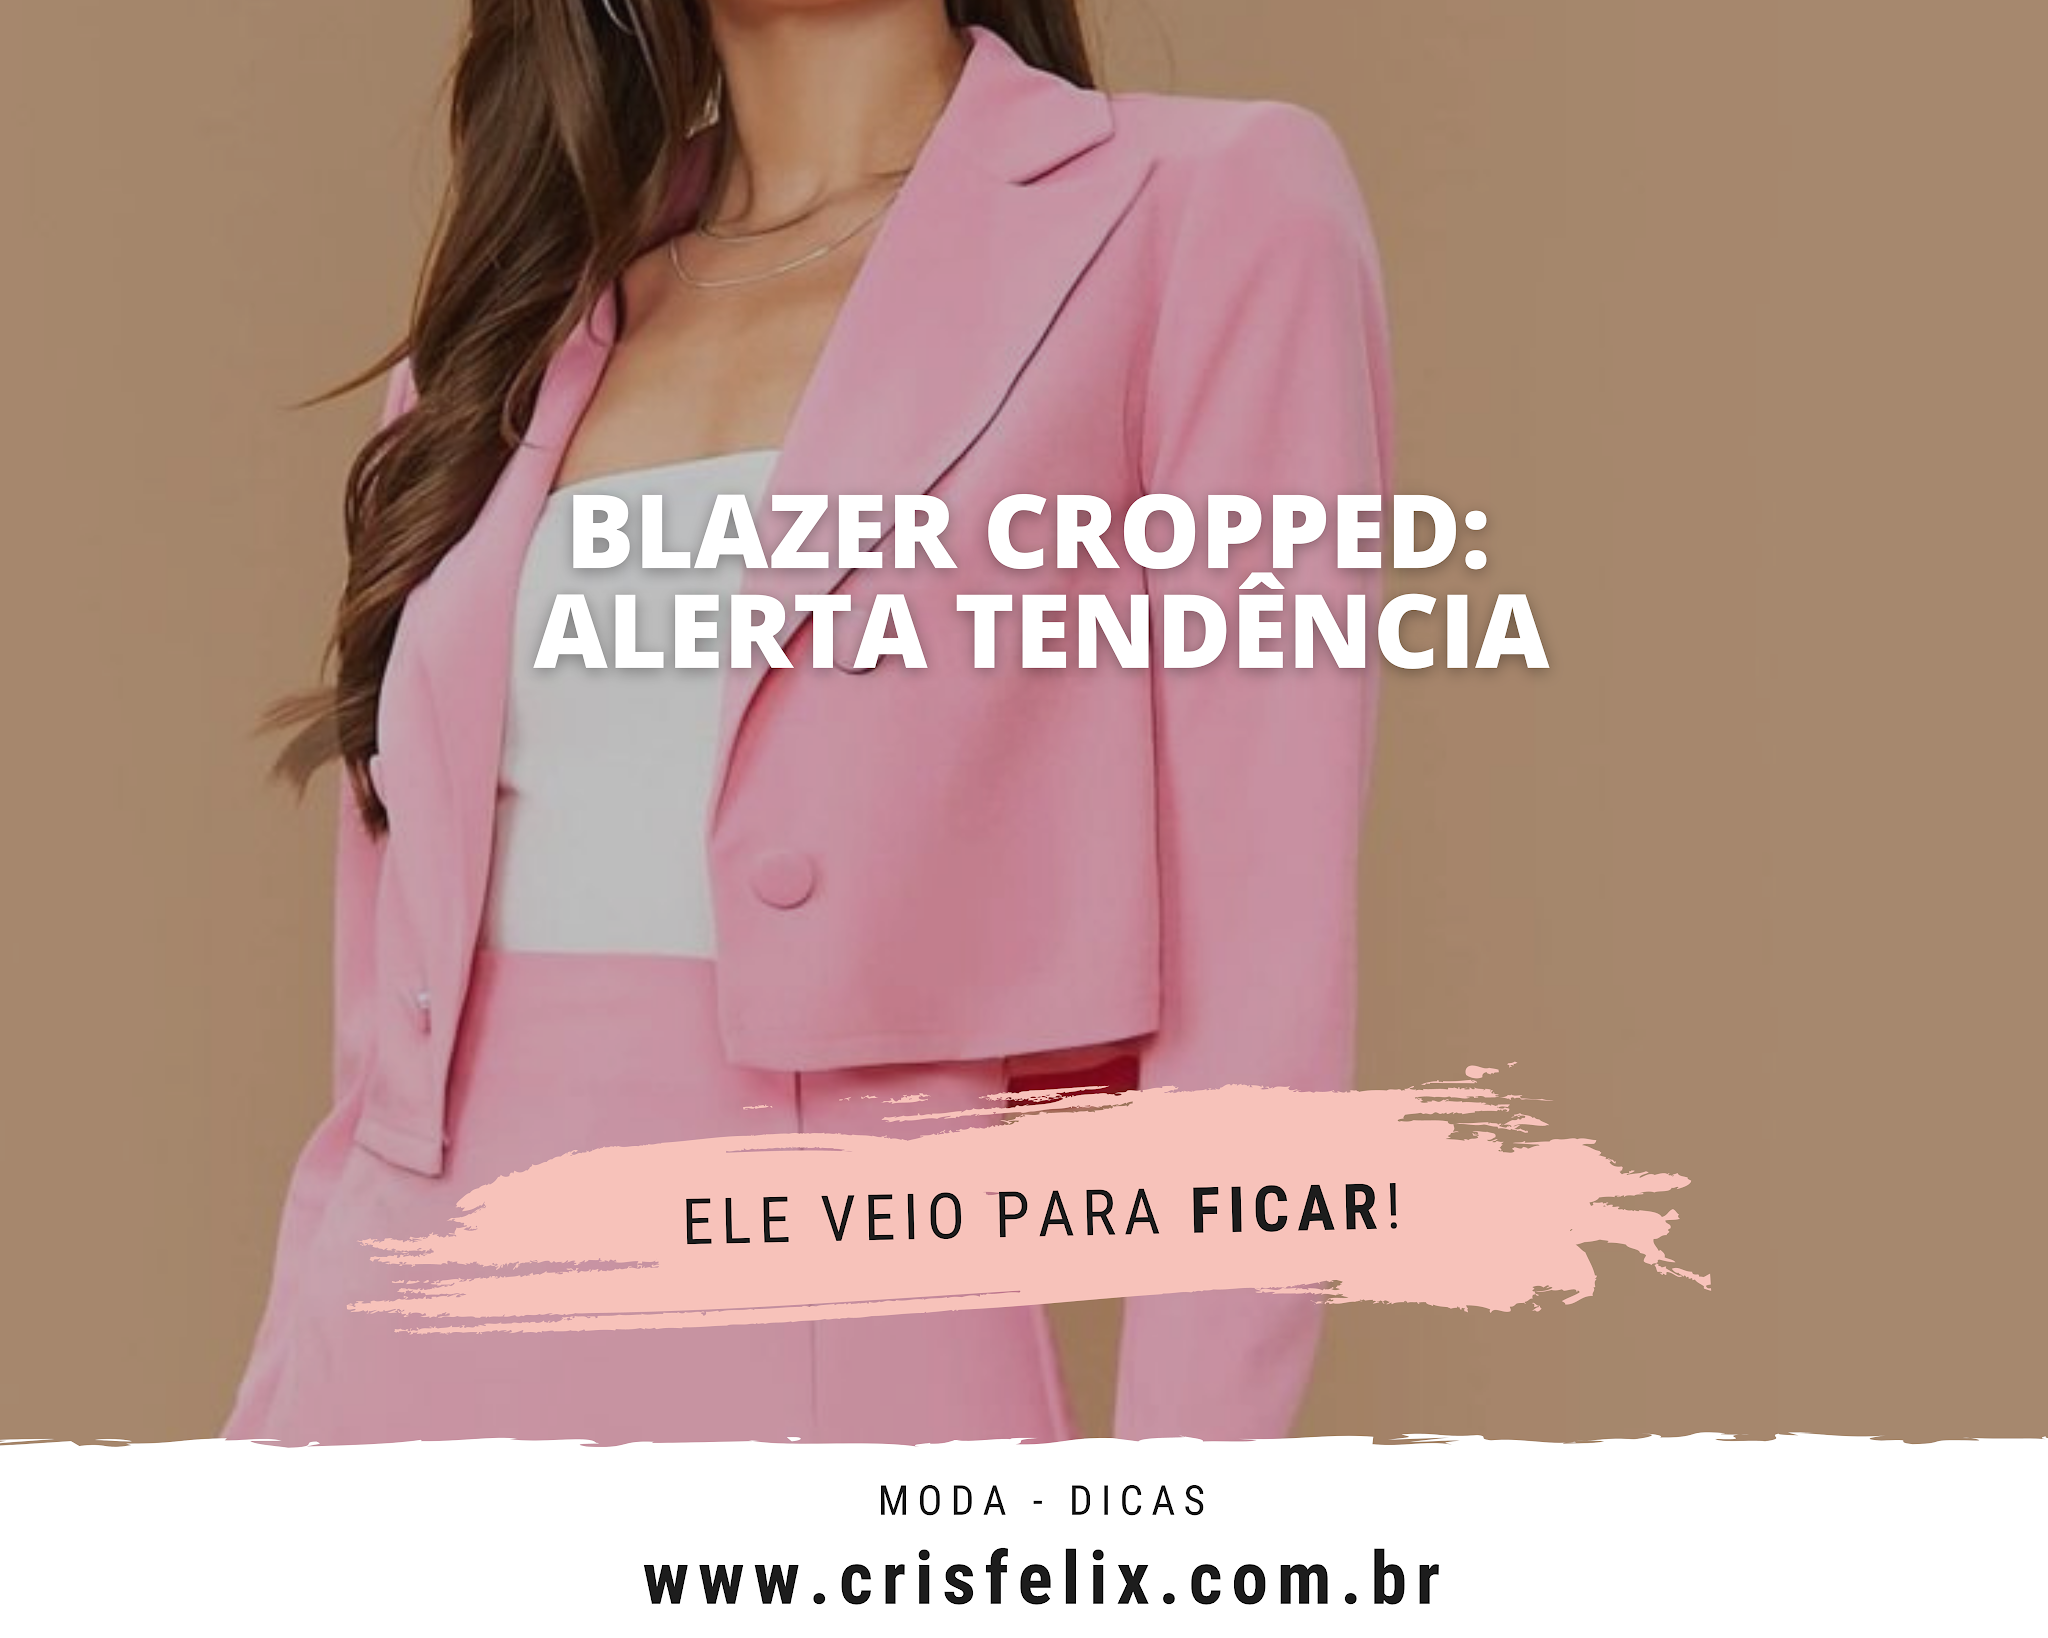 Blazer cropped: alerta tendência